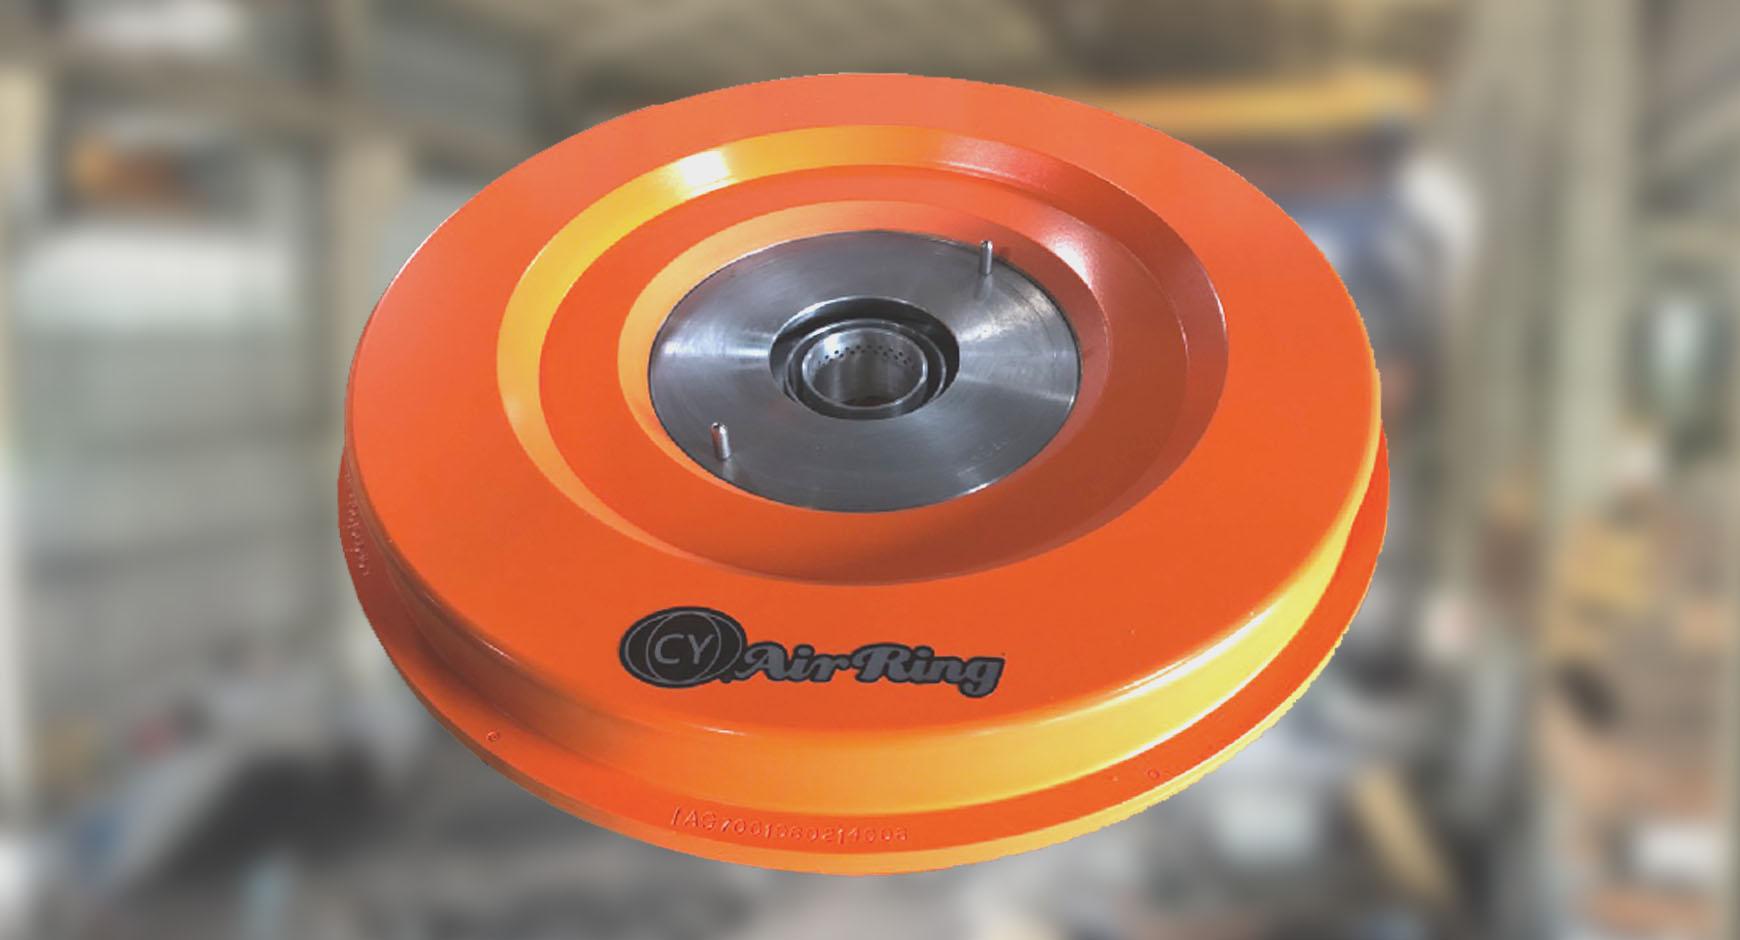 Dual Lips Air Ring - ฟิล์มเป่าเย็นเร็วและพื้นผิวเรียบร้อย